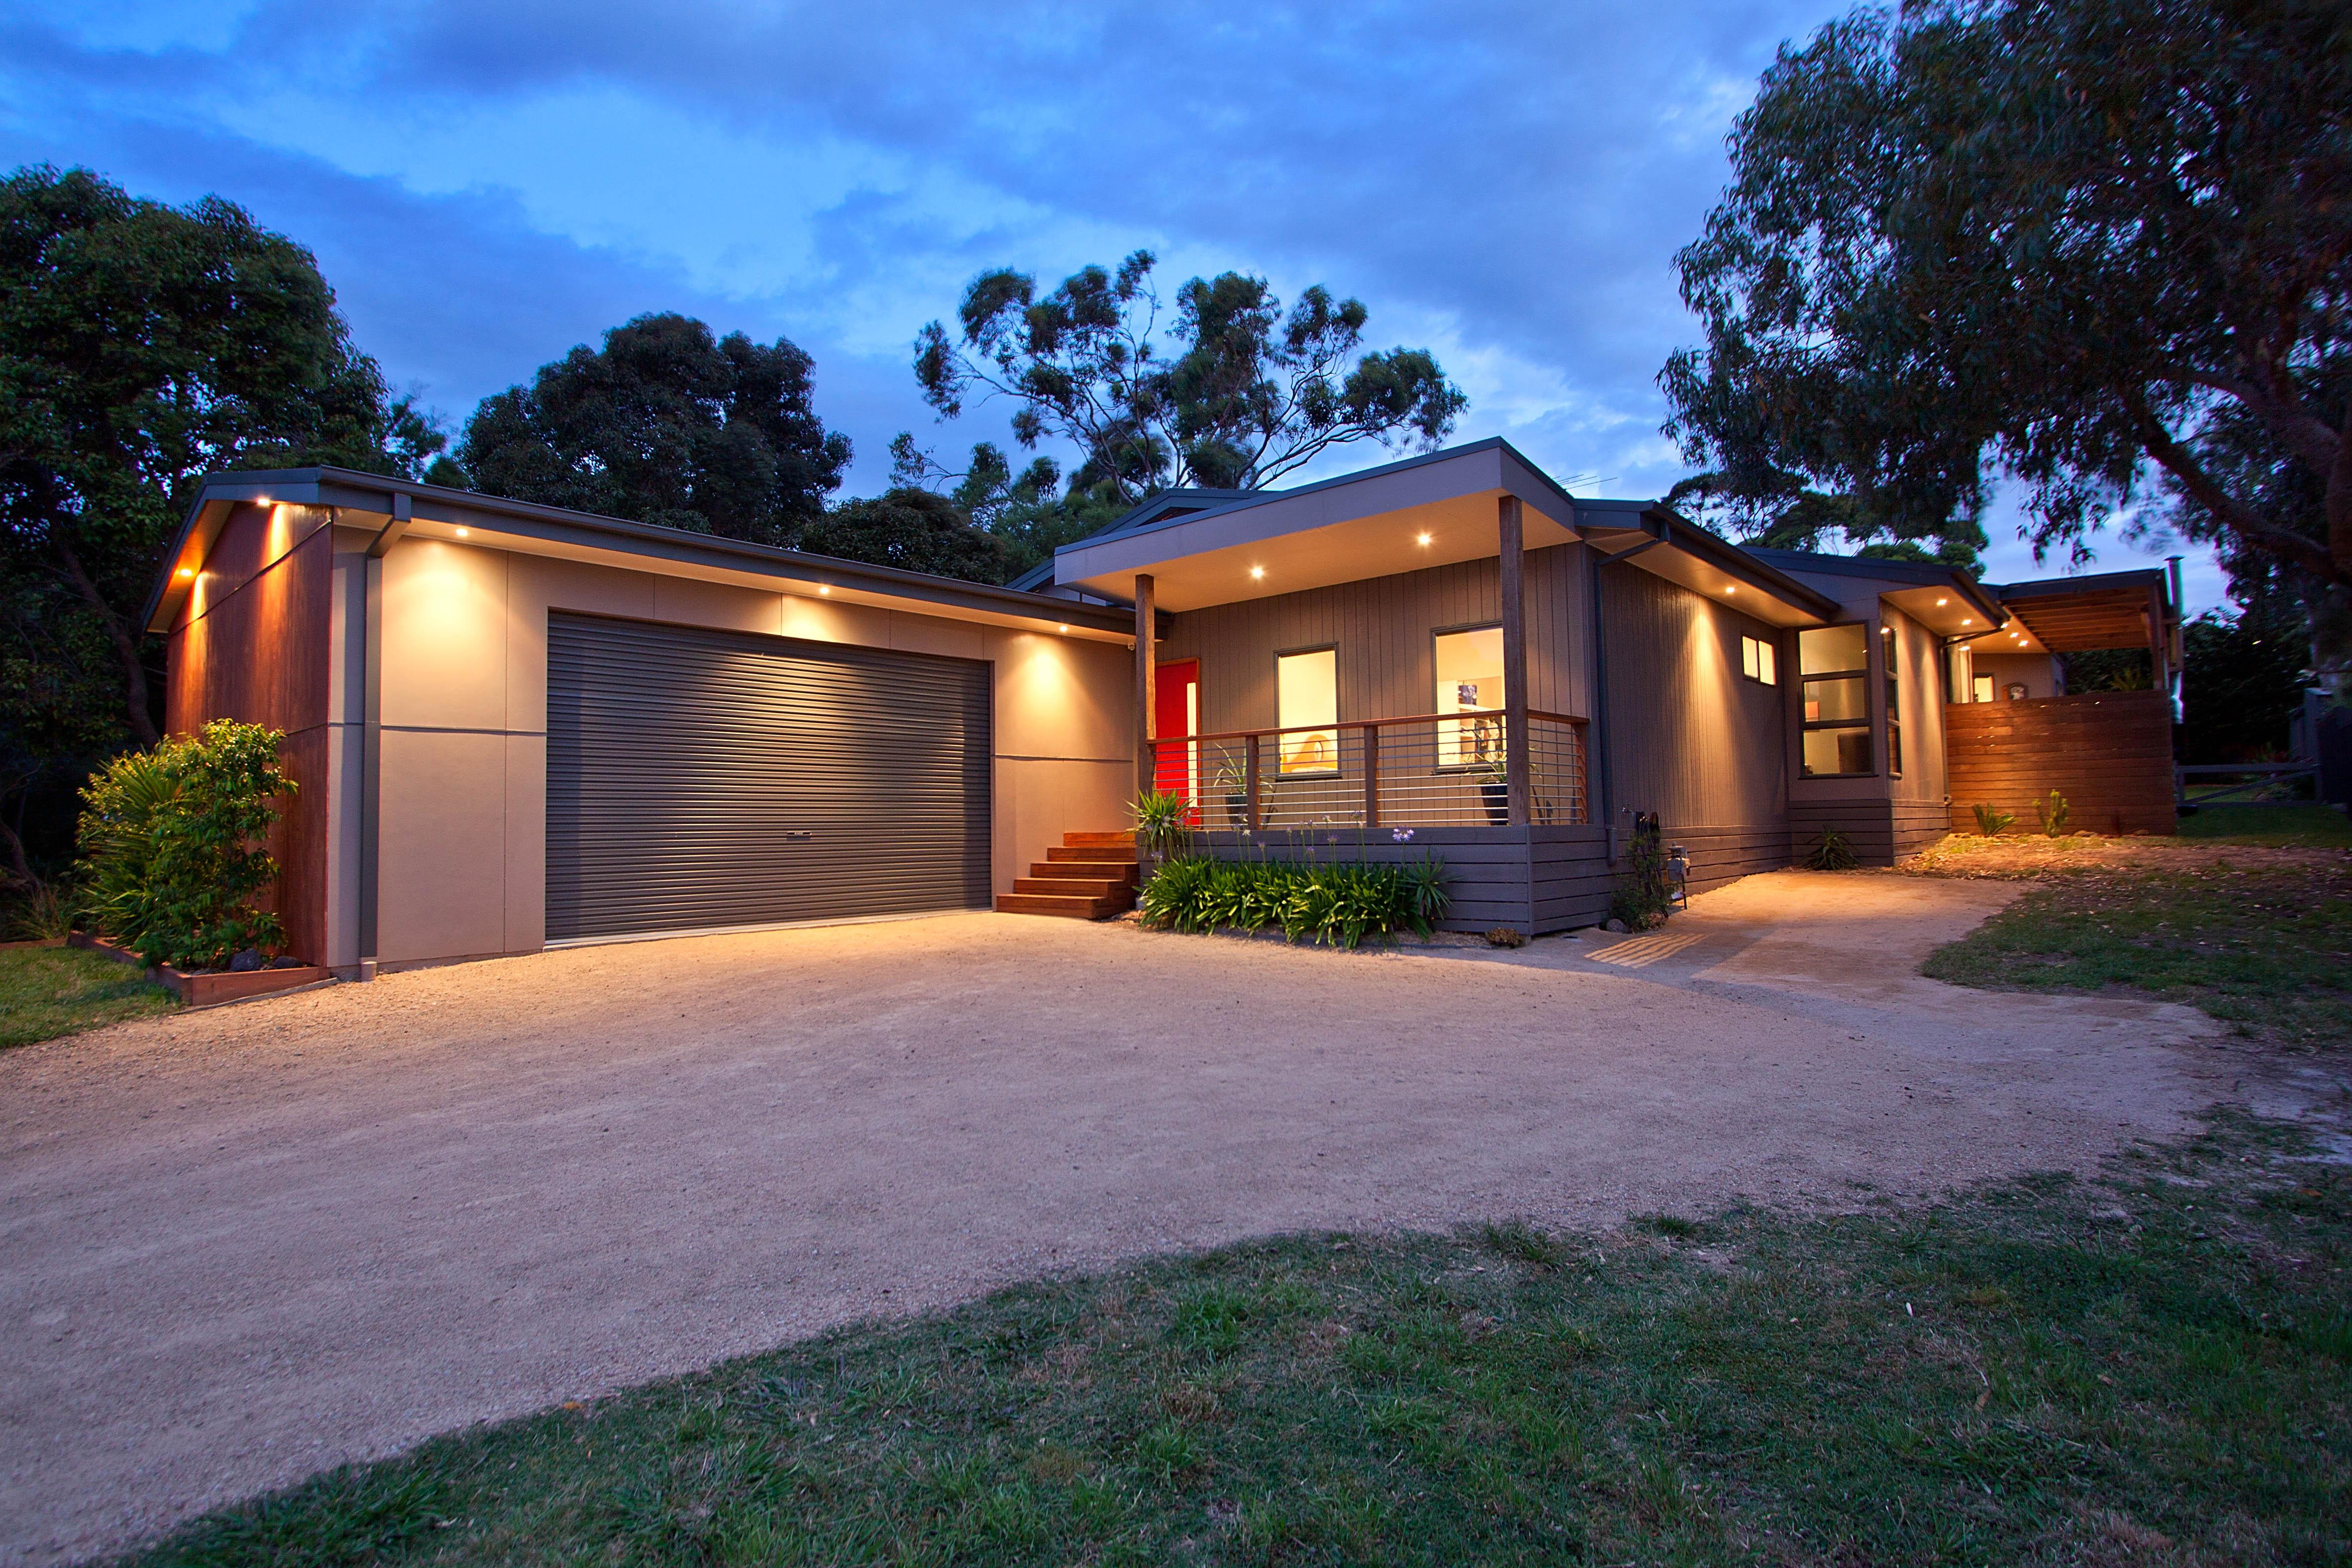 New House Melbourne External Melbourne And Mornington Peninsula